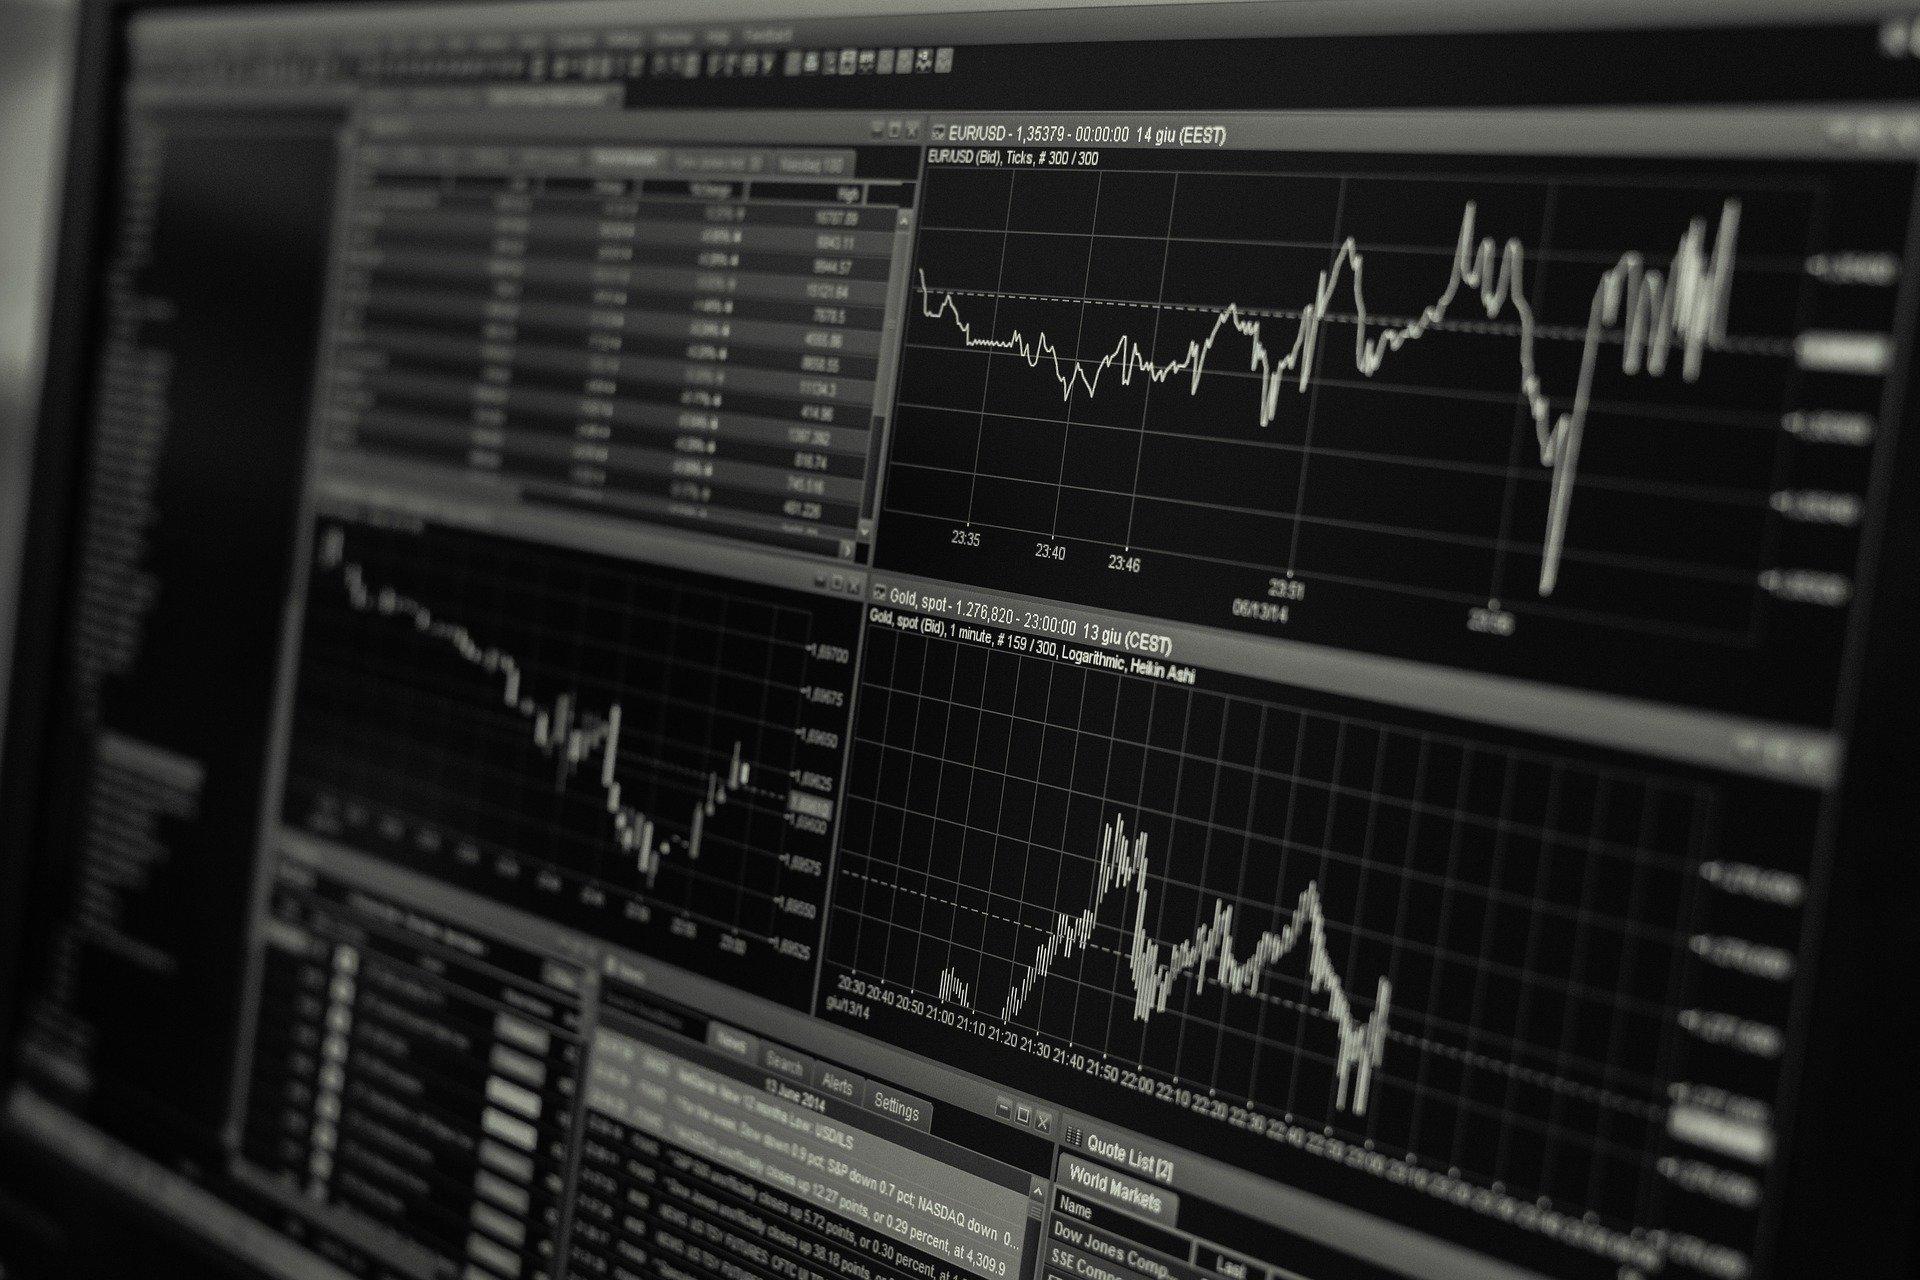 Predictive Analytics & Capital Markets: An Assessment